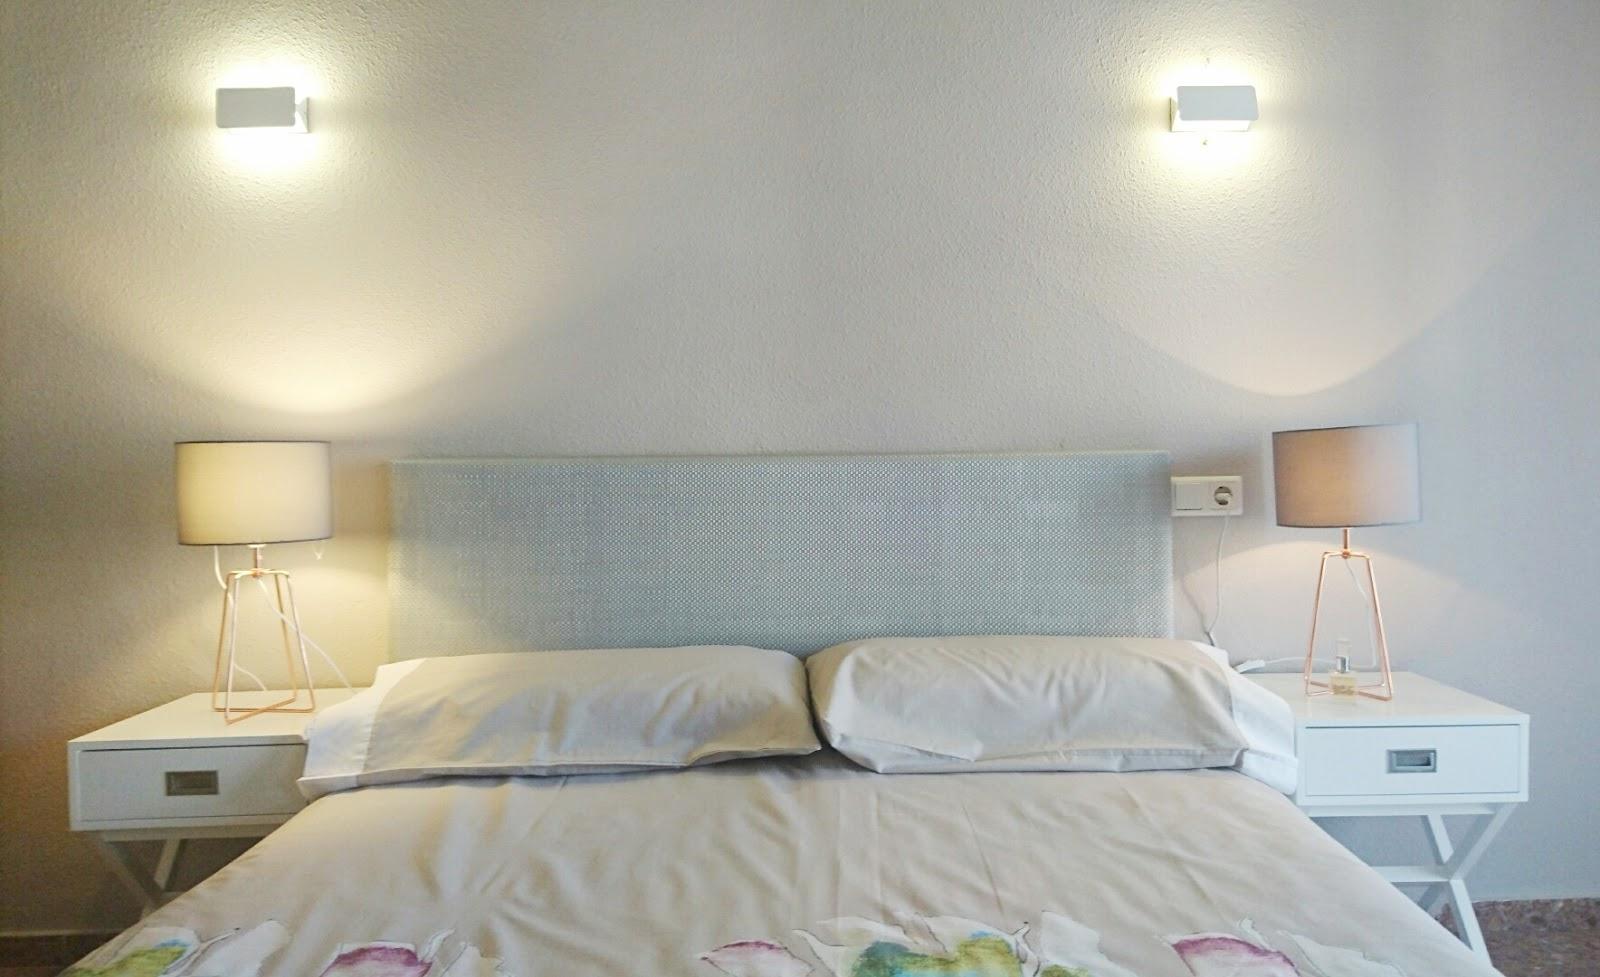 Un dormitorio para un apartamento de playa + shopping online